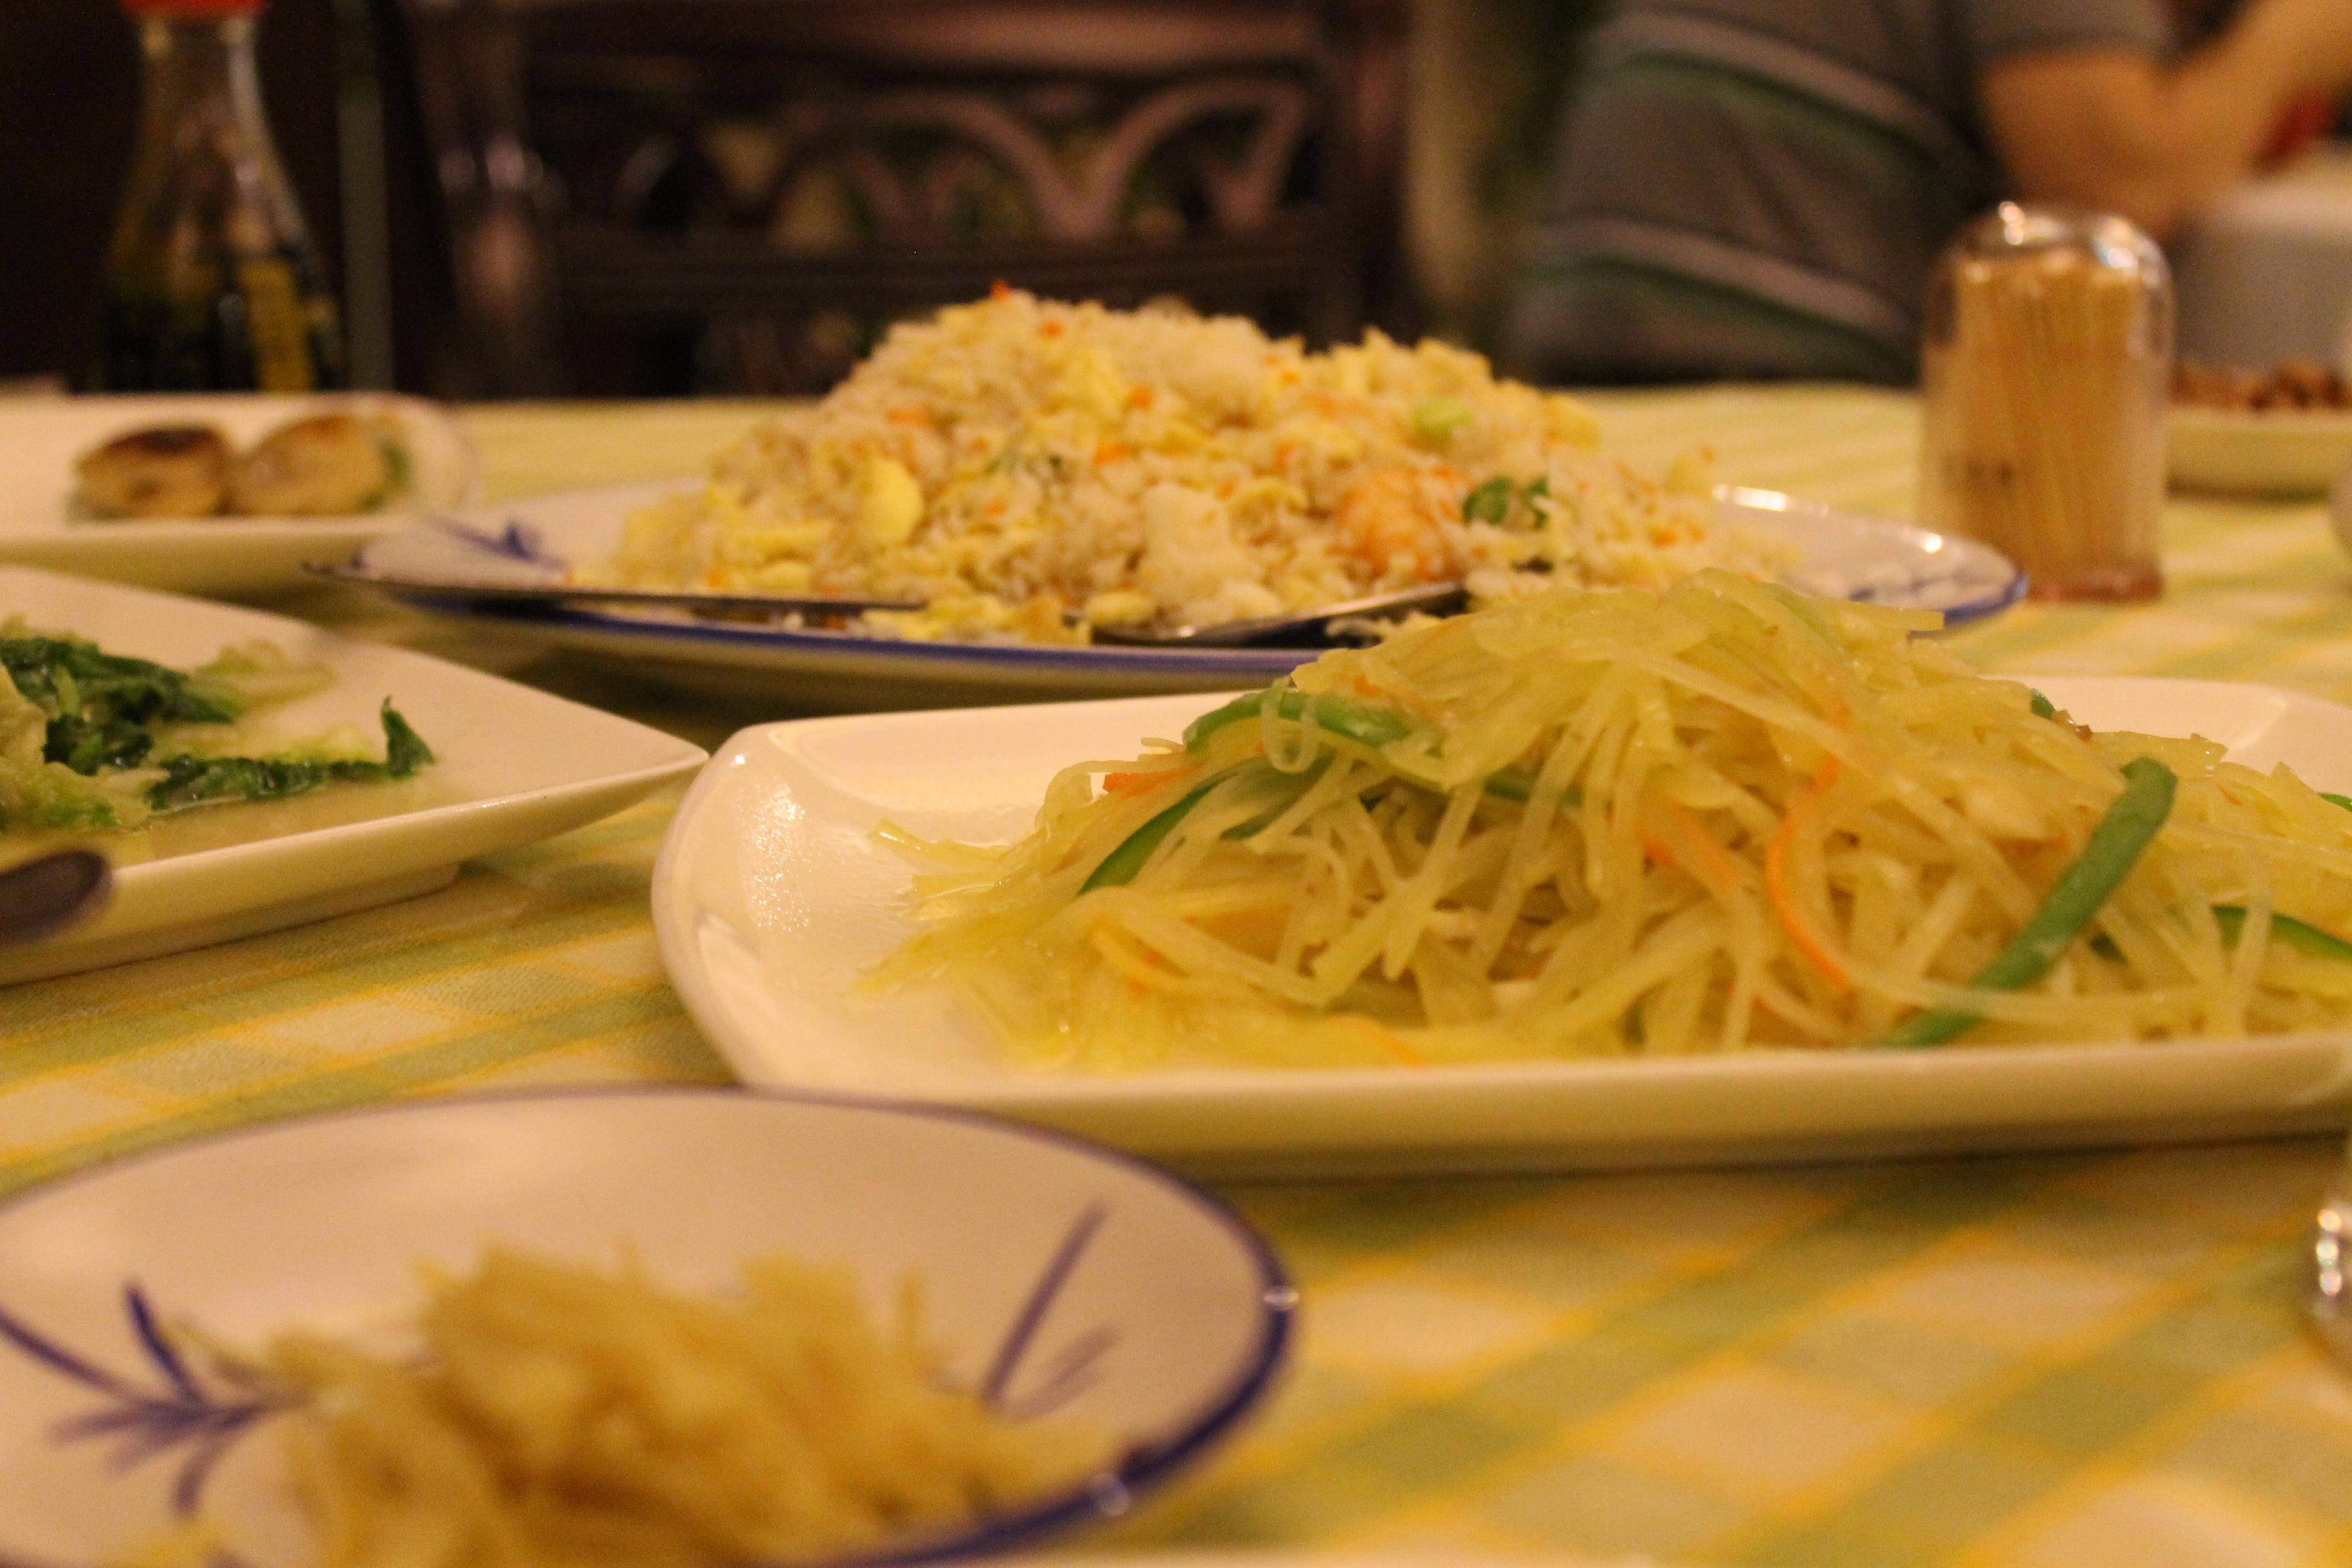 Chinese food on china made in Bangladesh.